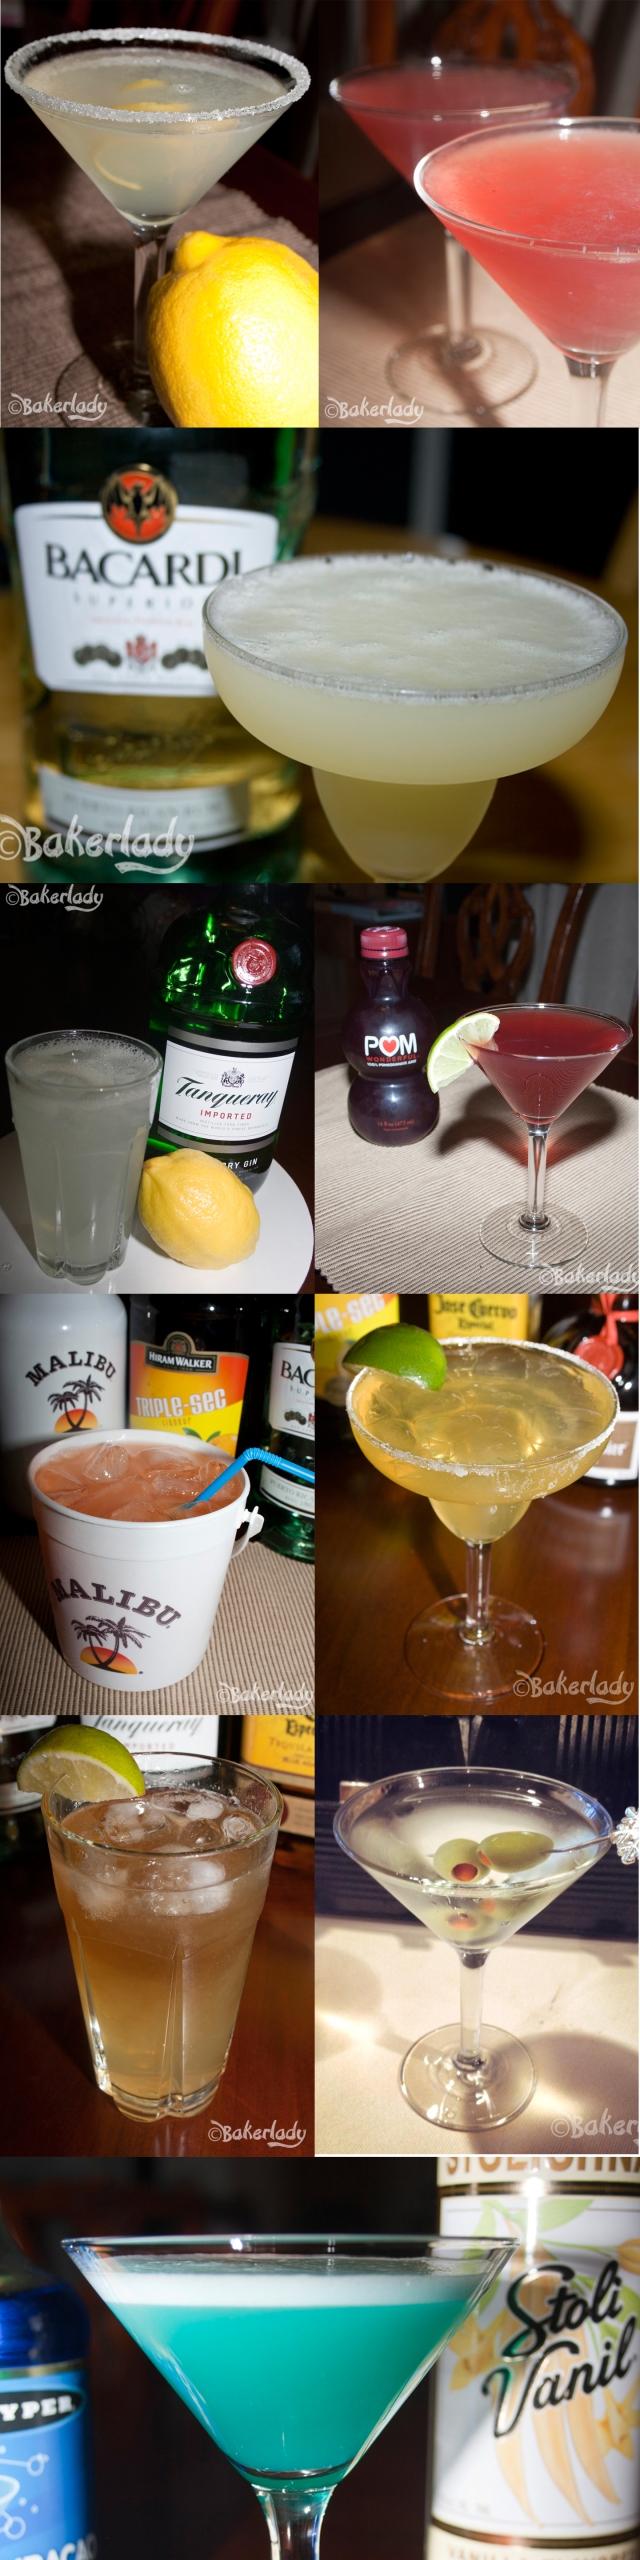 Top 10 Drinks for Summer! - Bakerlady